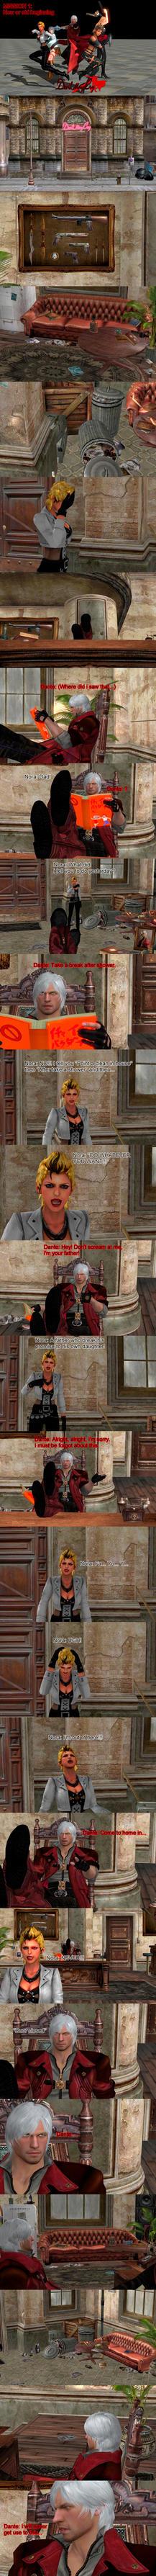 DMC Dante's daughter 1-1 by LarsJunFan